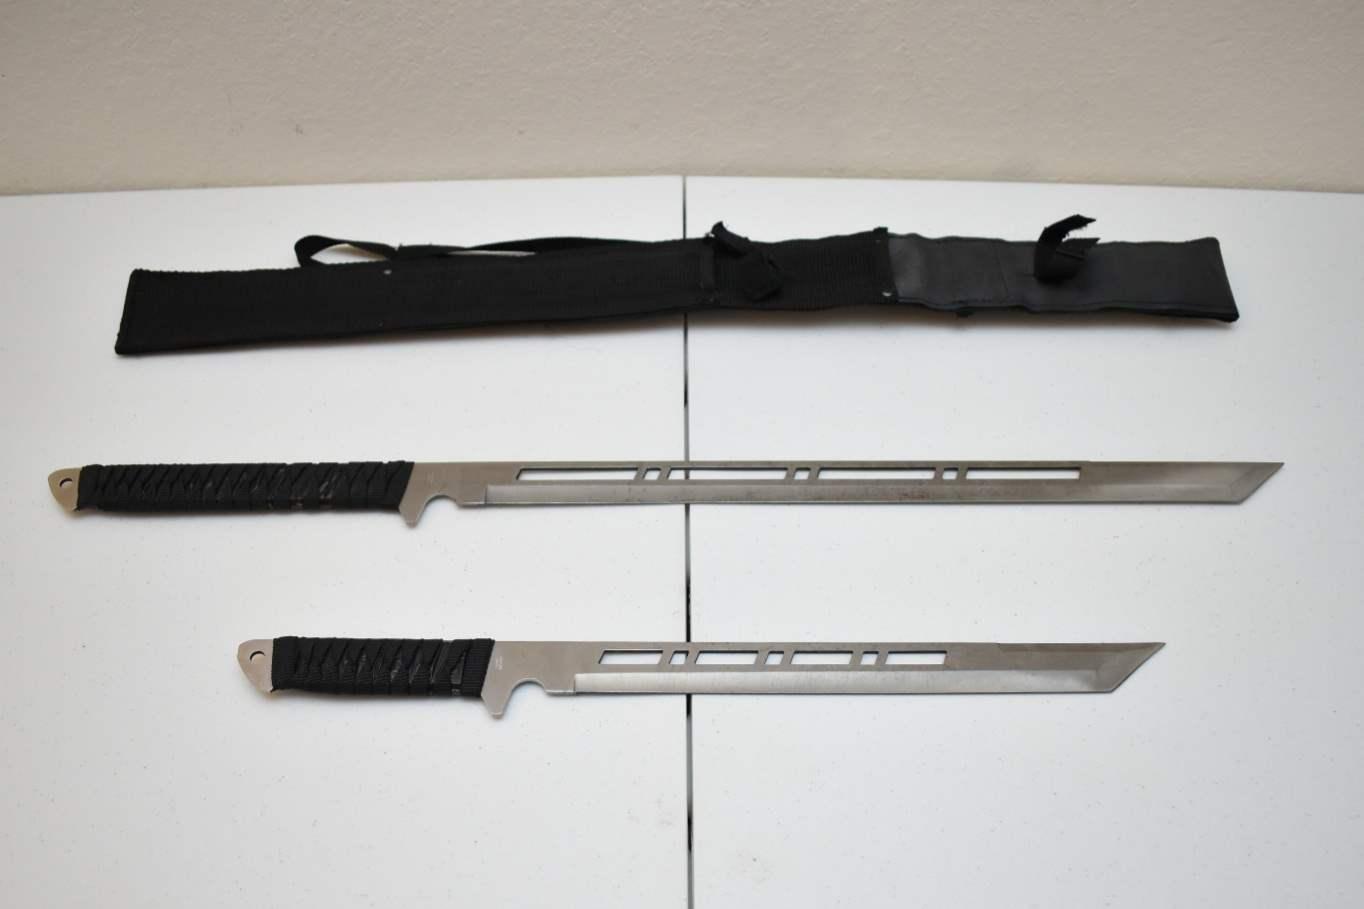 (2) Ninja Swords with Sheath